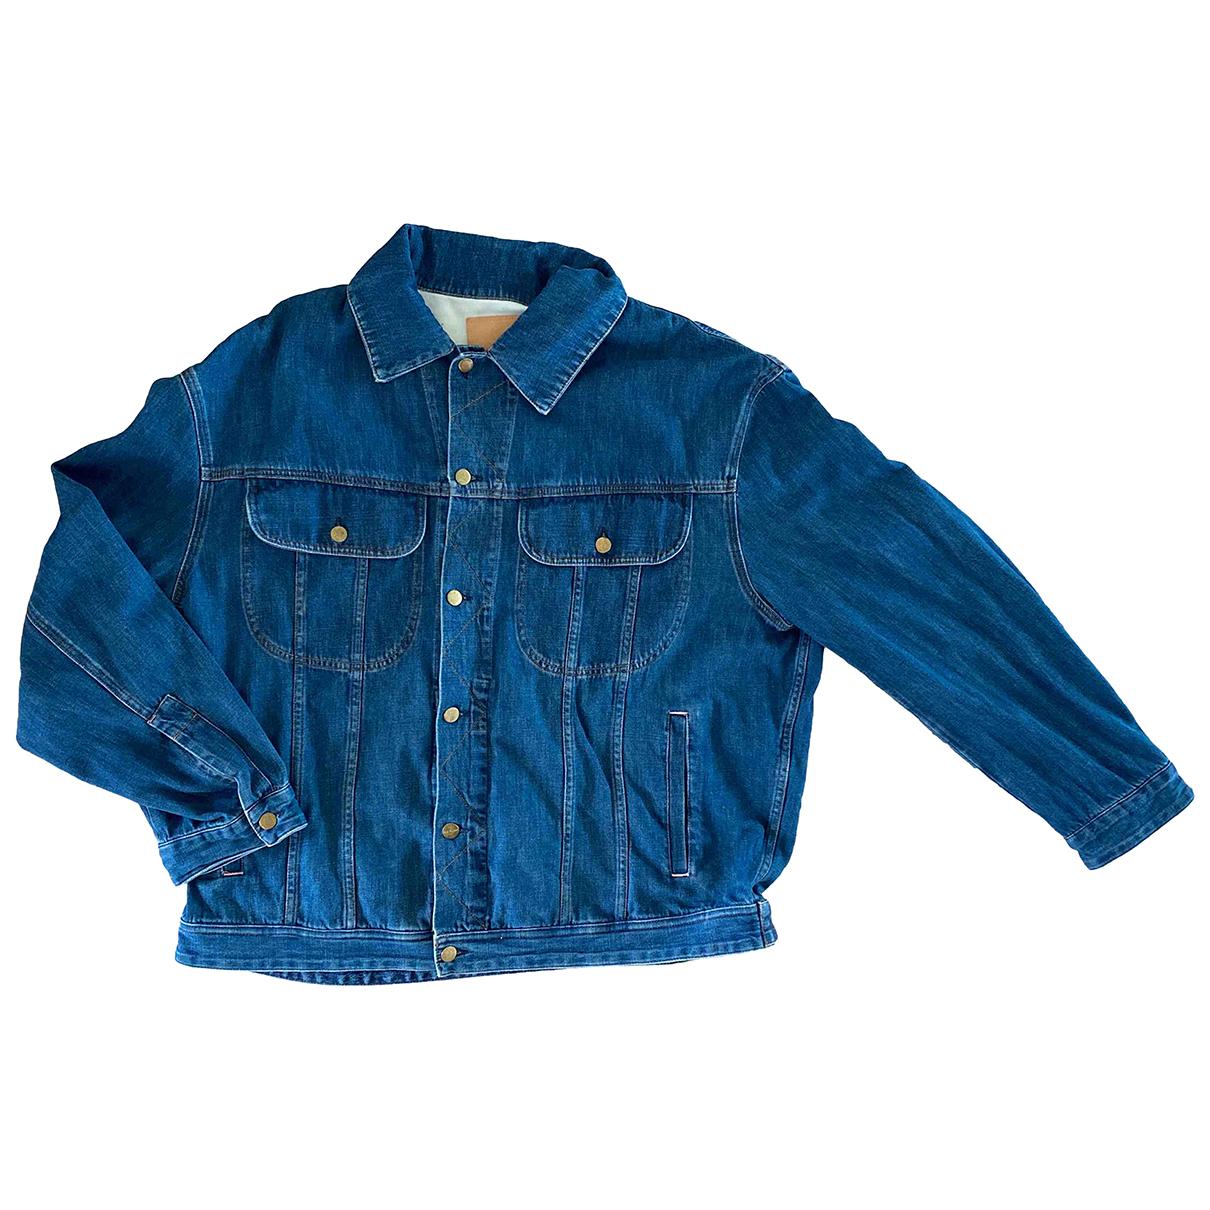 Acne Studios \N Blue Denim - Jeans jacket  for Men S International